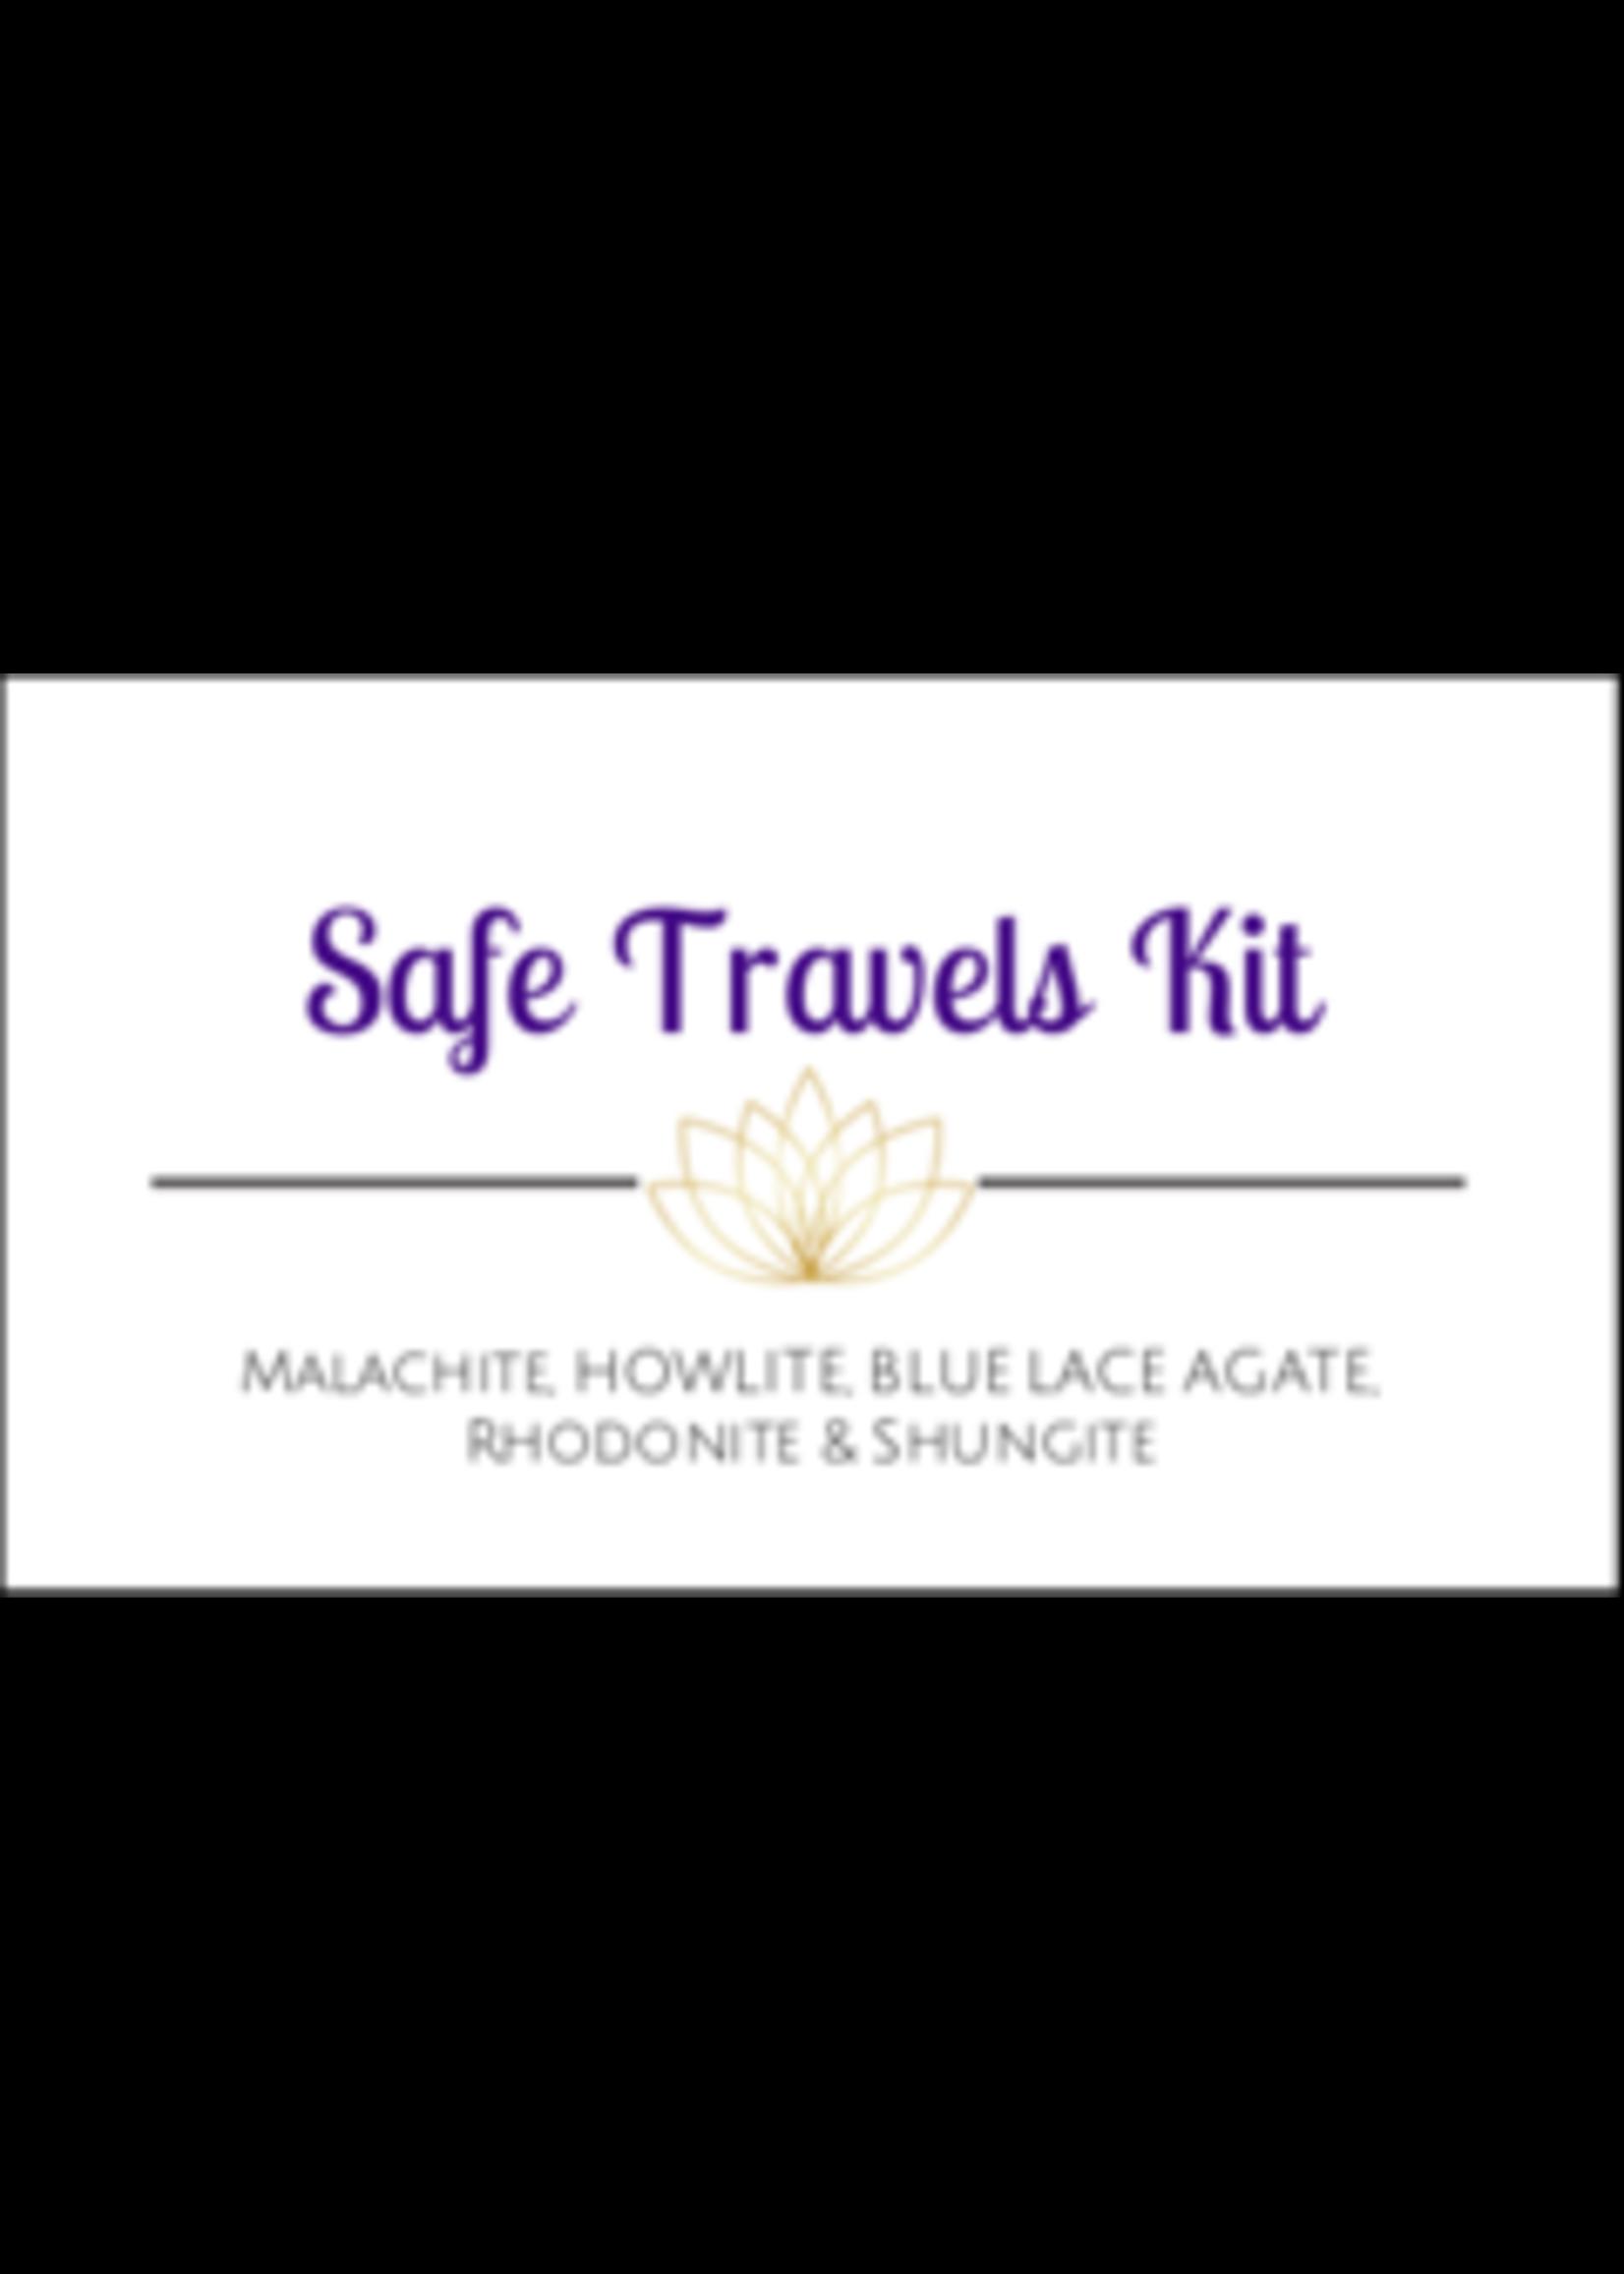 Safe Travels Crystal Kit Cards -Box of 100